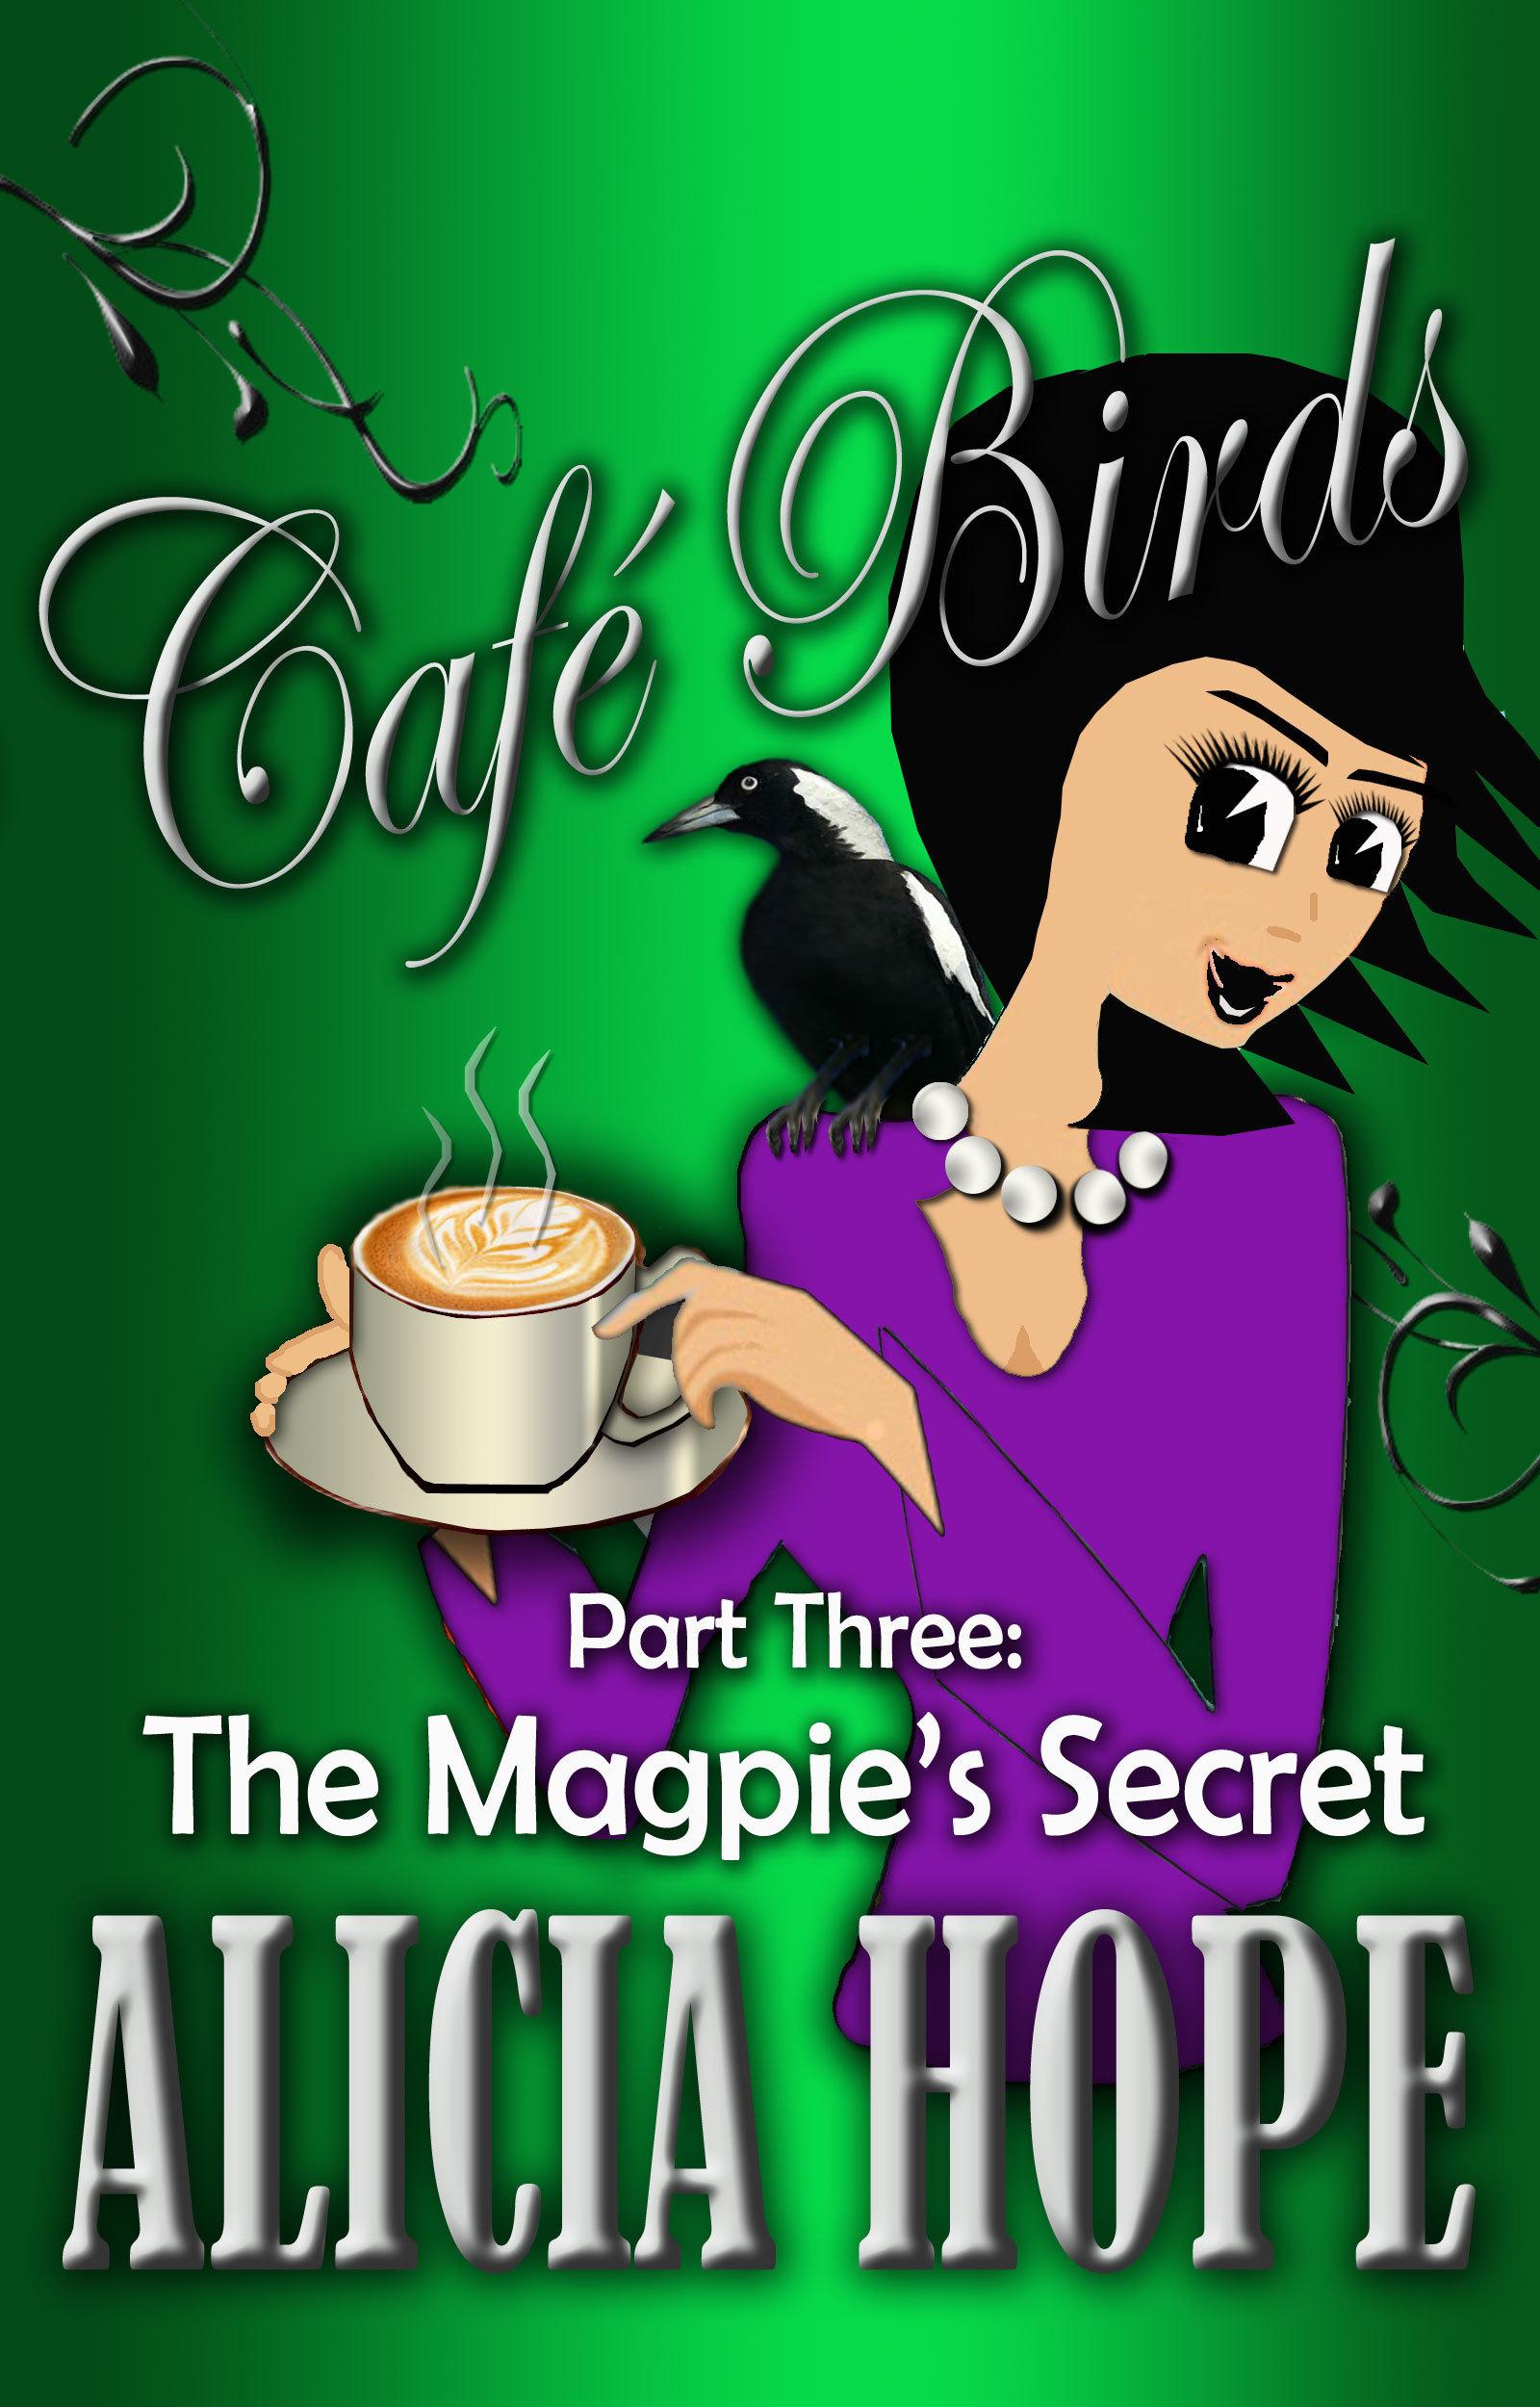 Cafe Birds: The Magpie's Secret